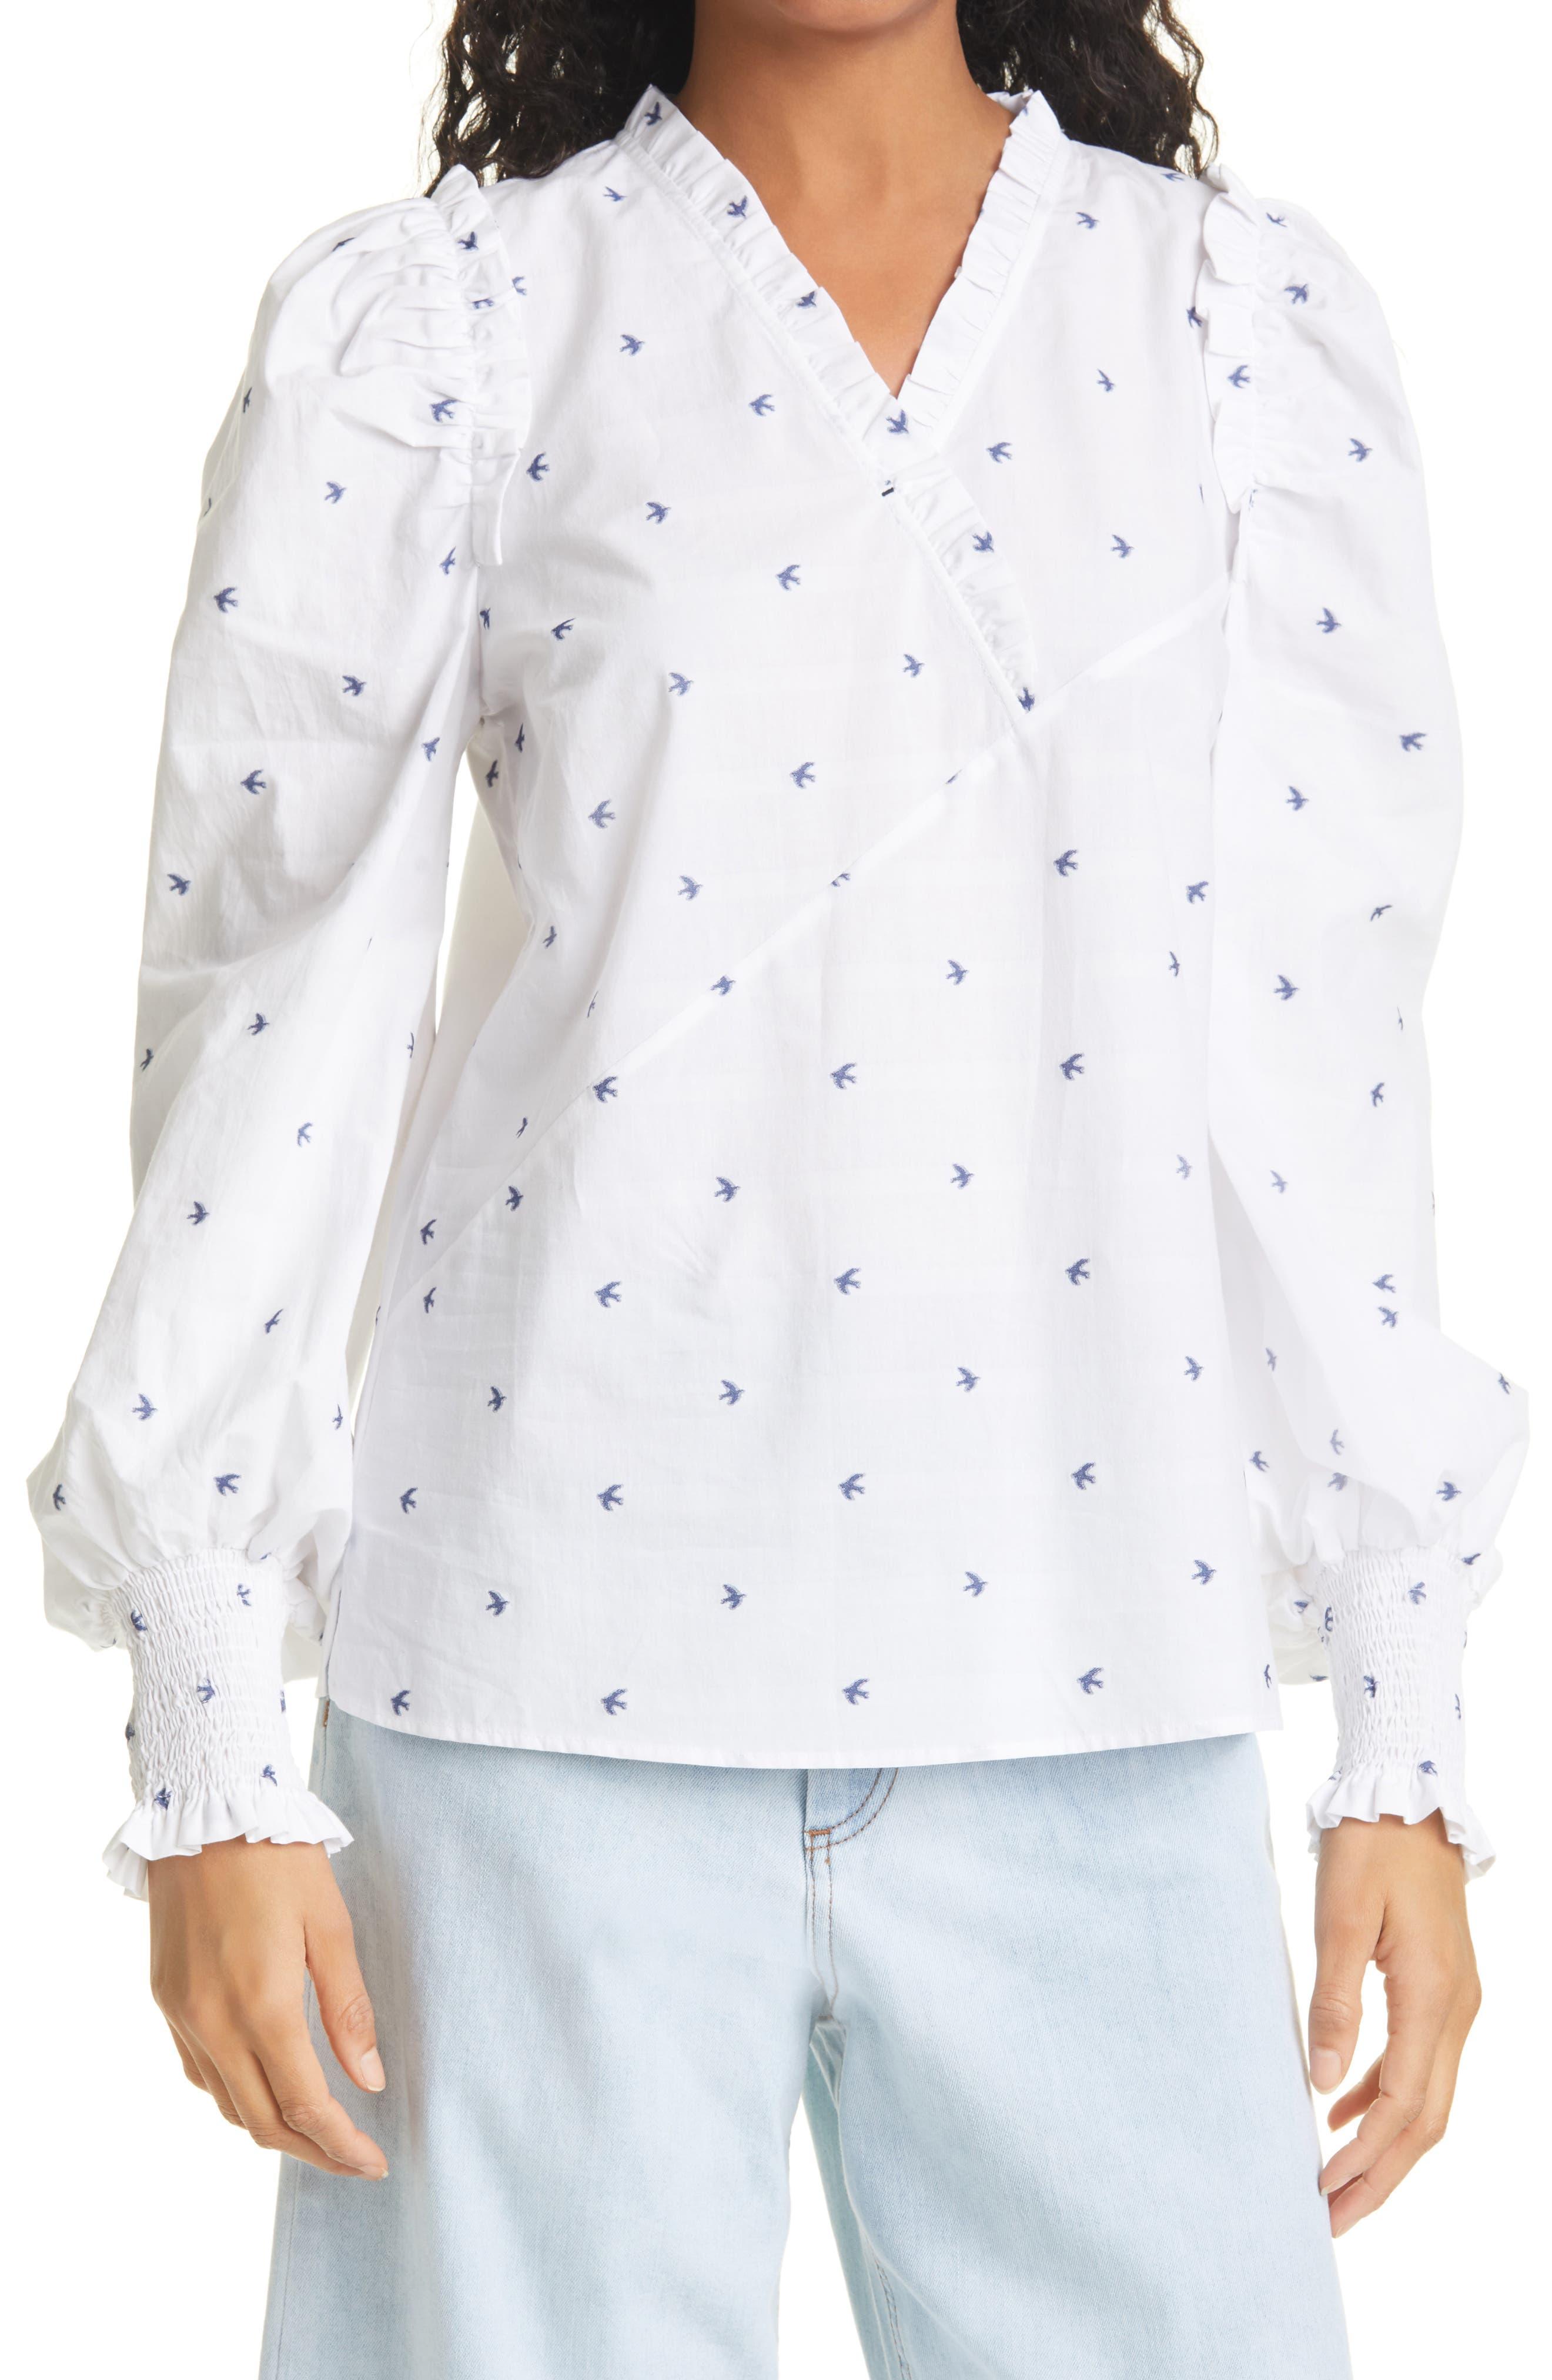 Tama Ruffle Long Sleeve Shirt